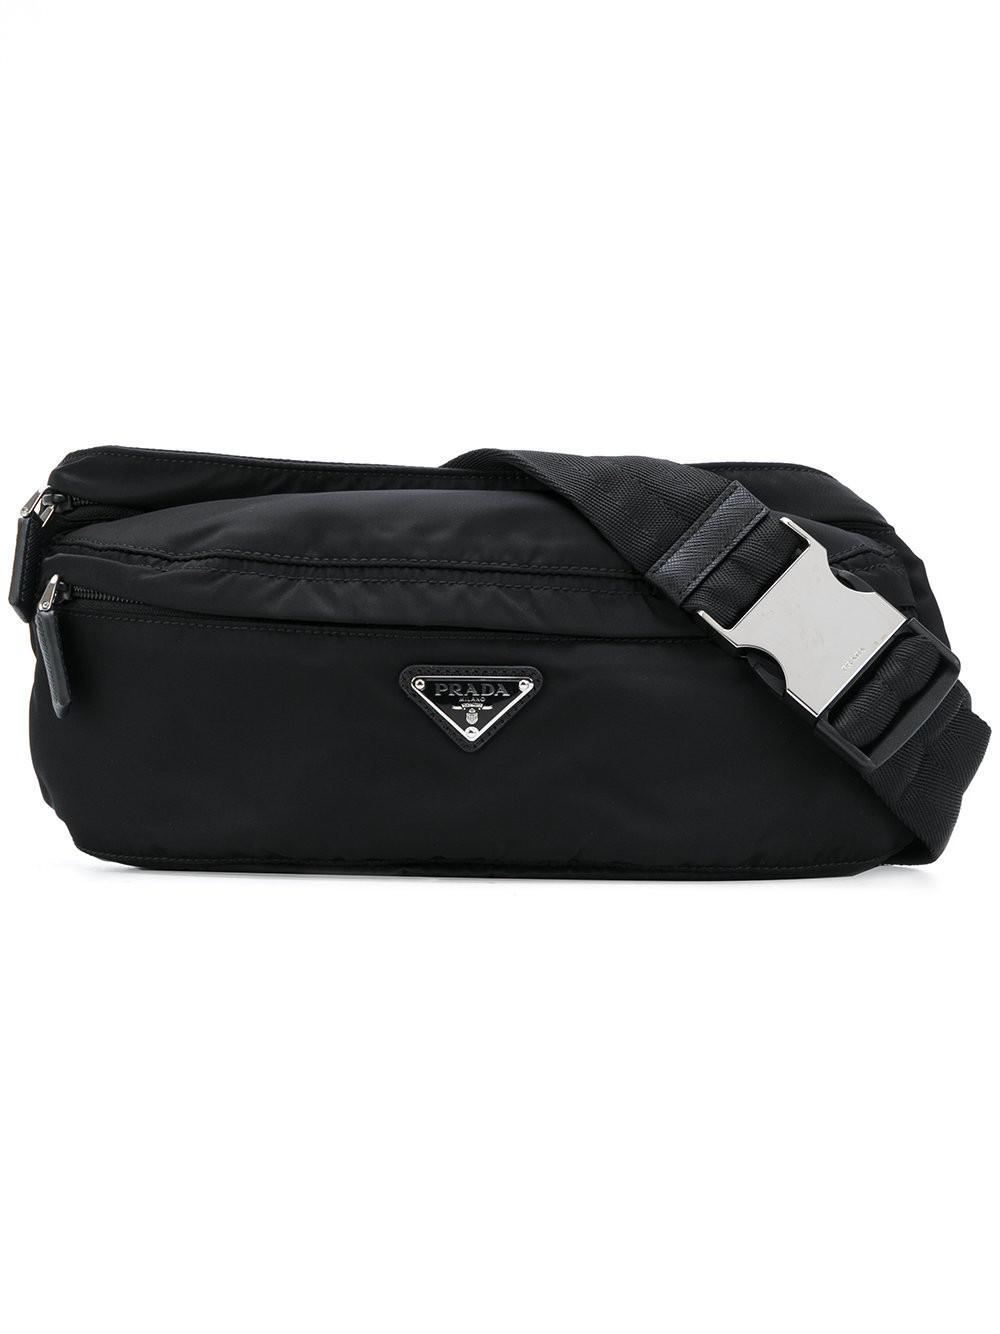 317c62f9e65a Prada Fanny Pack Style Bag in Black for Men - Lyst